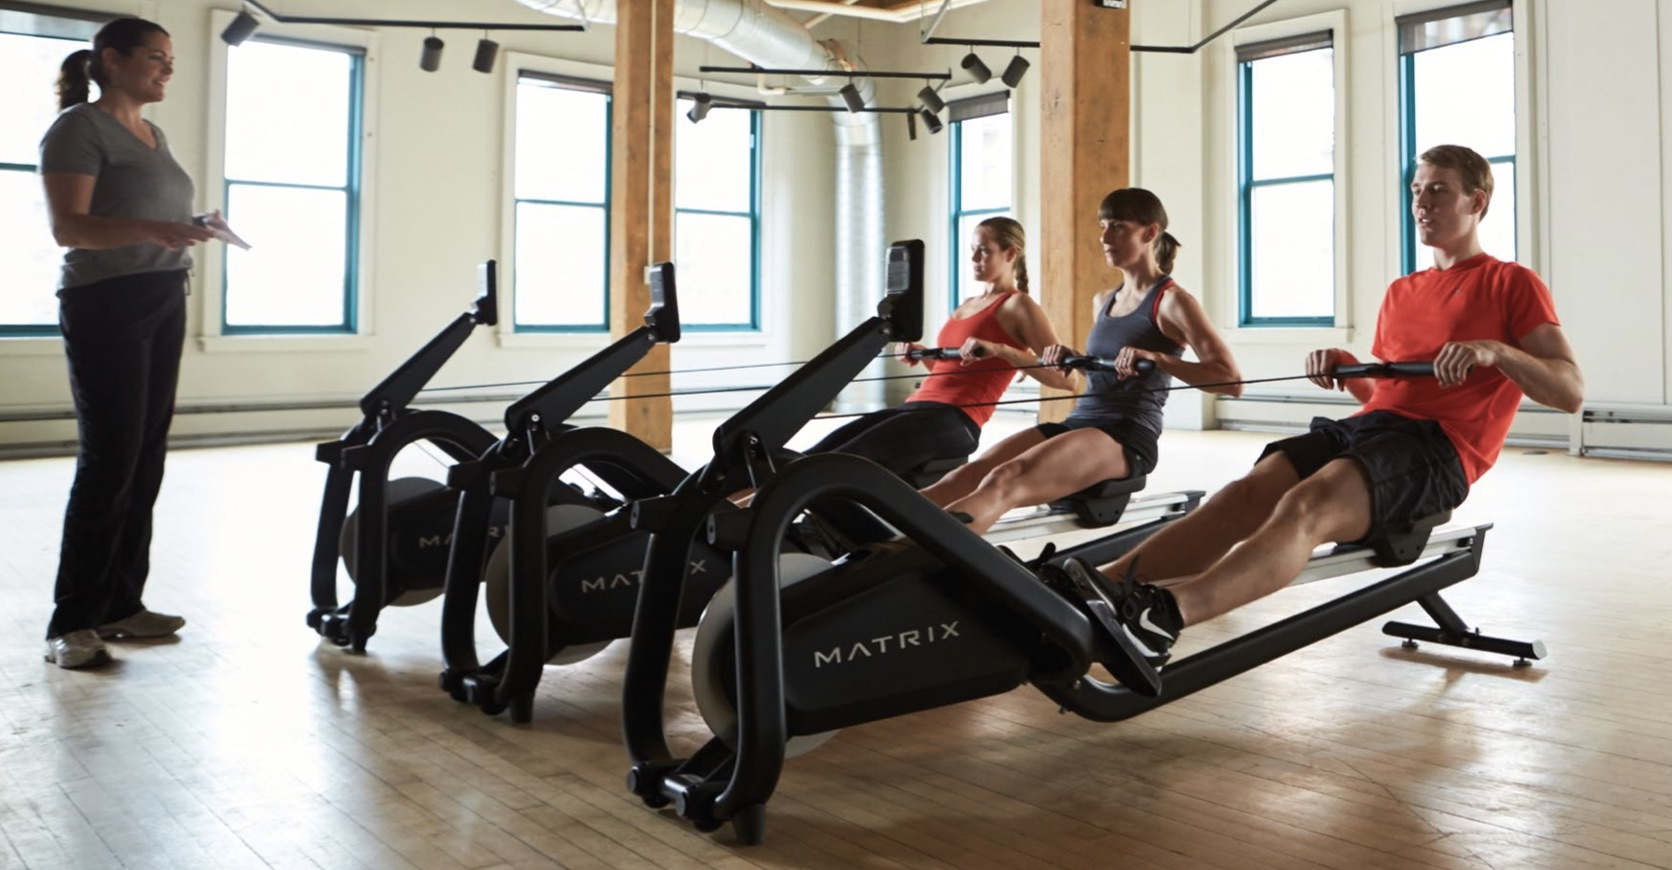 Matrix Rower Build Quality